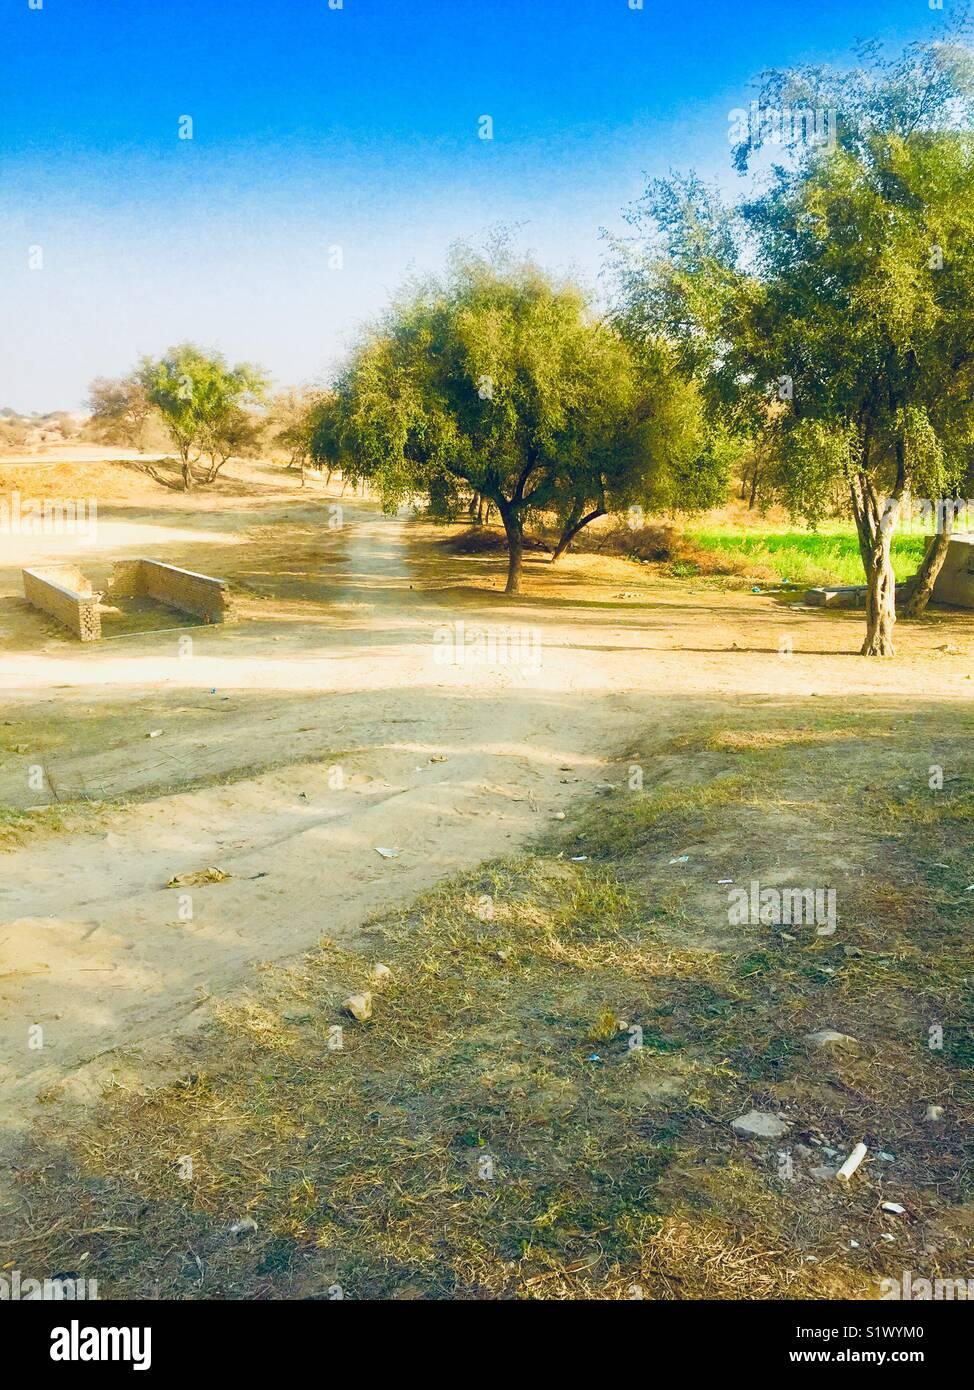 Unpaved way view in village of beautiful Pakistan - Stock Image